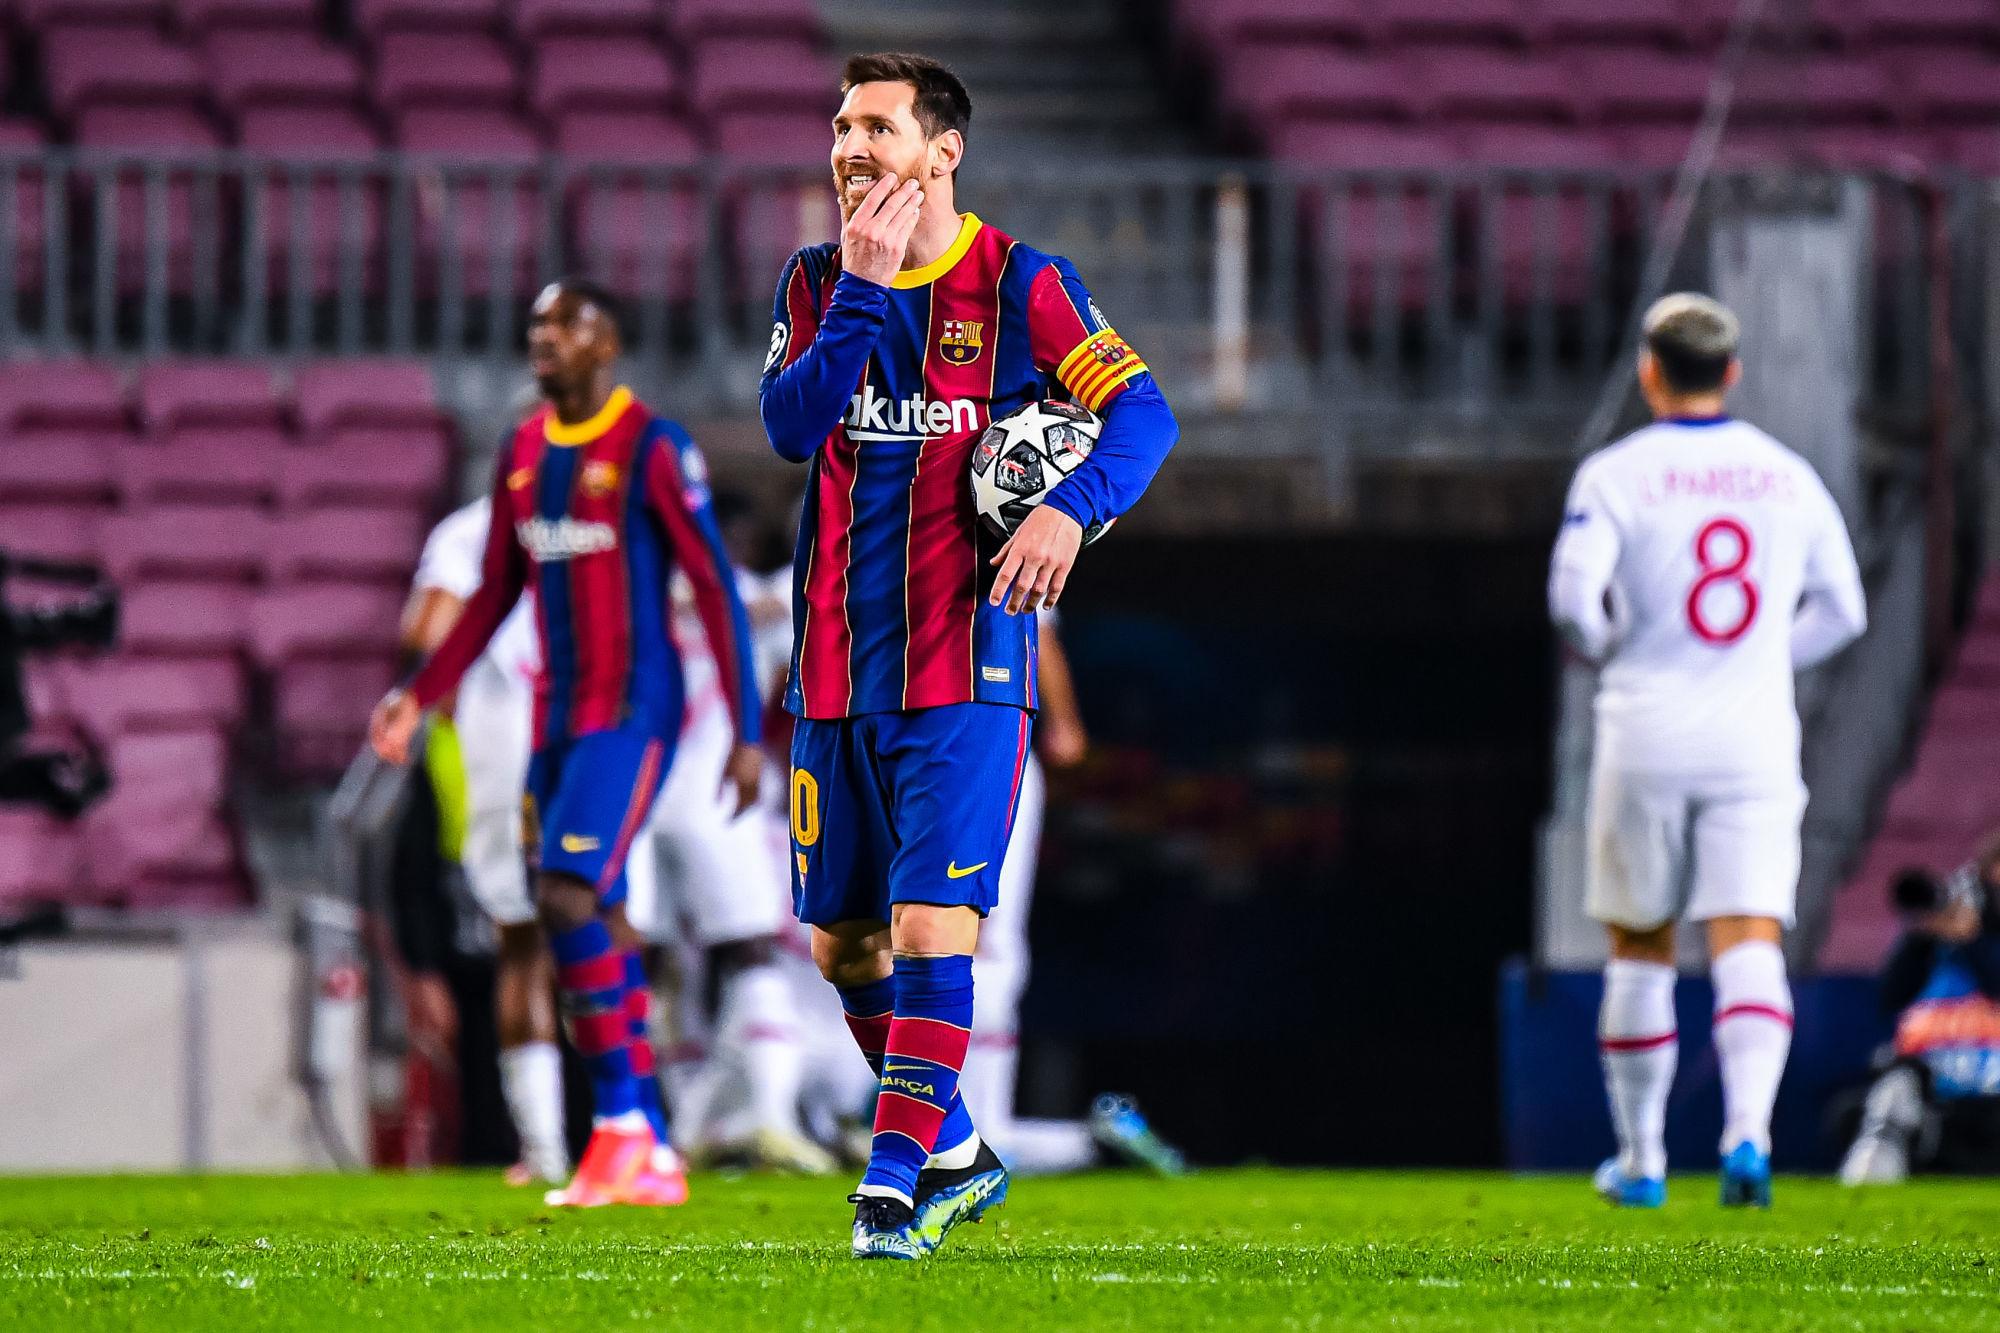 Mercato - Messi cherche un logement à Paris, El Chiringuito tente de relancer le dossier